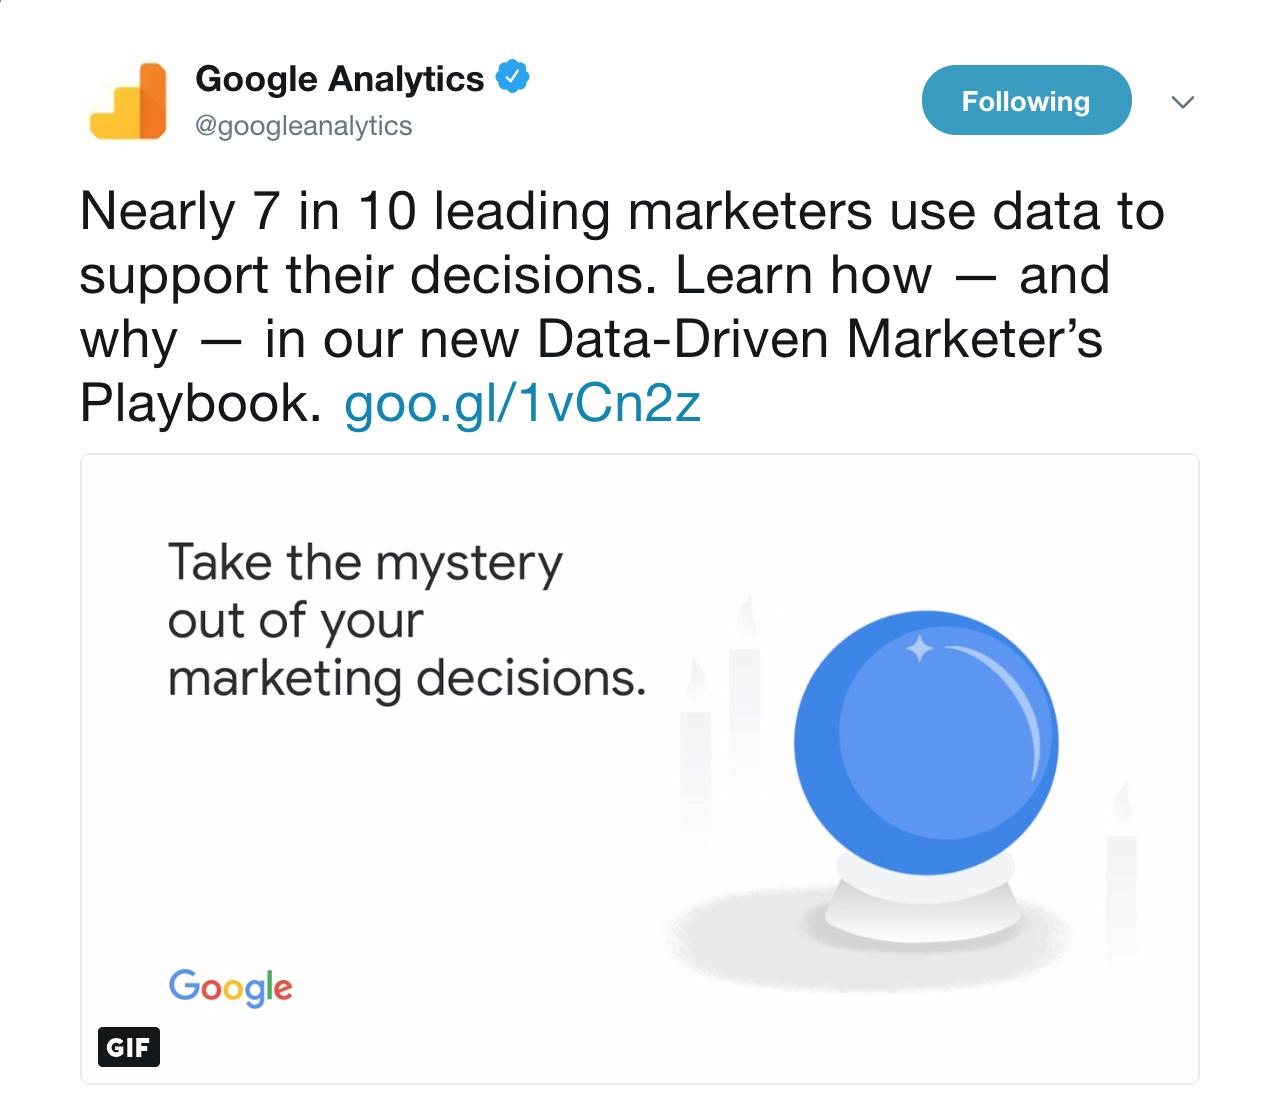 google-analytics-tweet-8.jpg